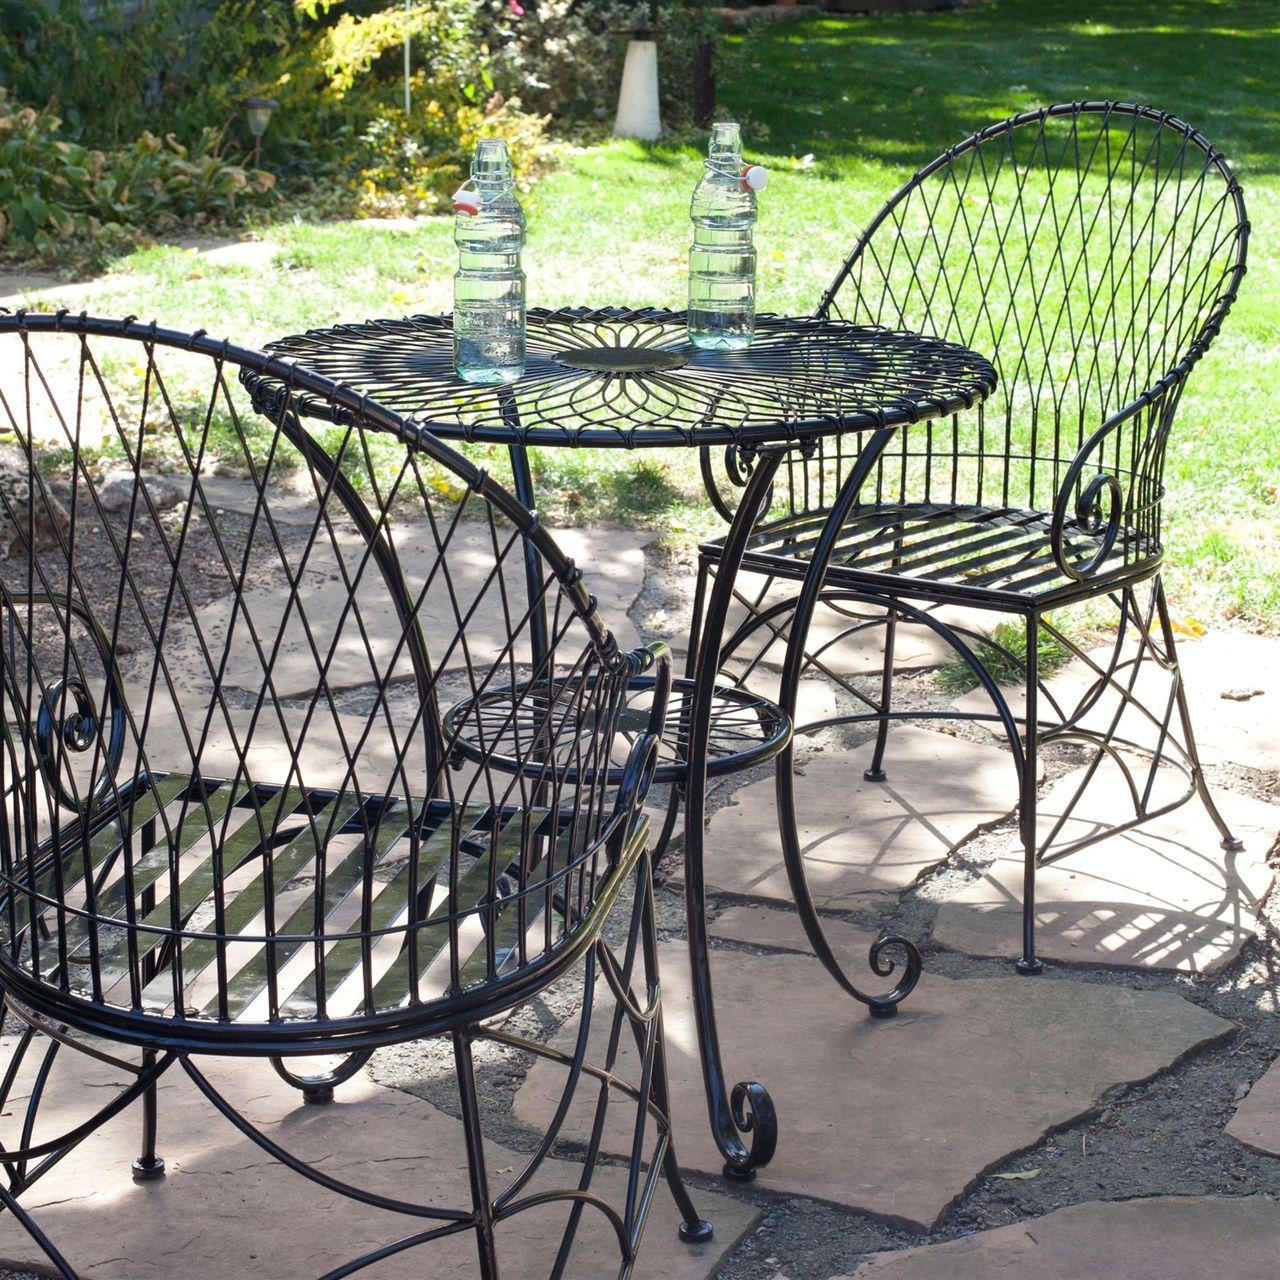 3 Piece Black Metal Patio Furniture Bistro Set With Round Table 2